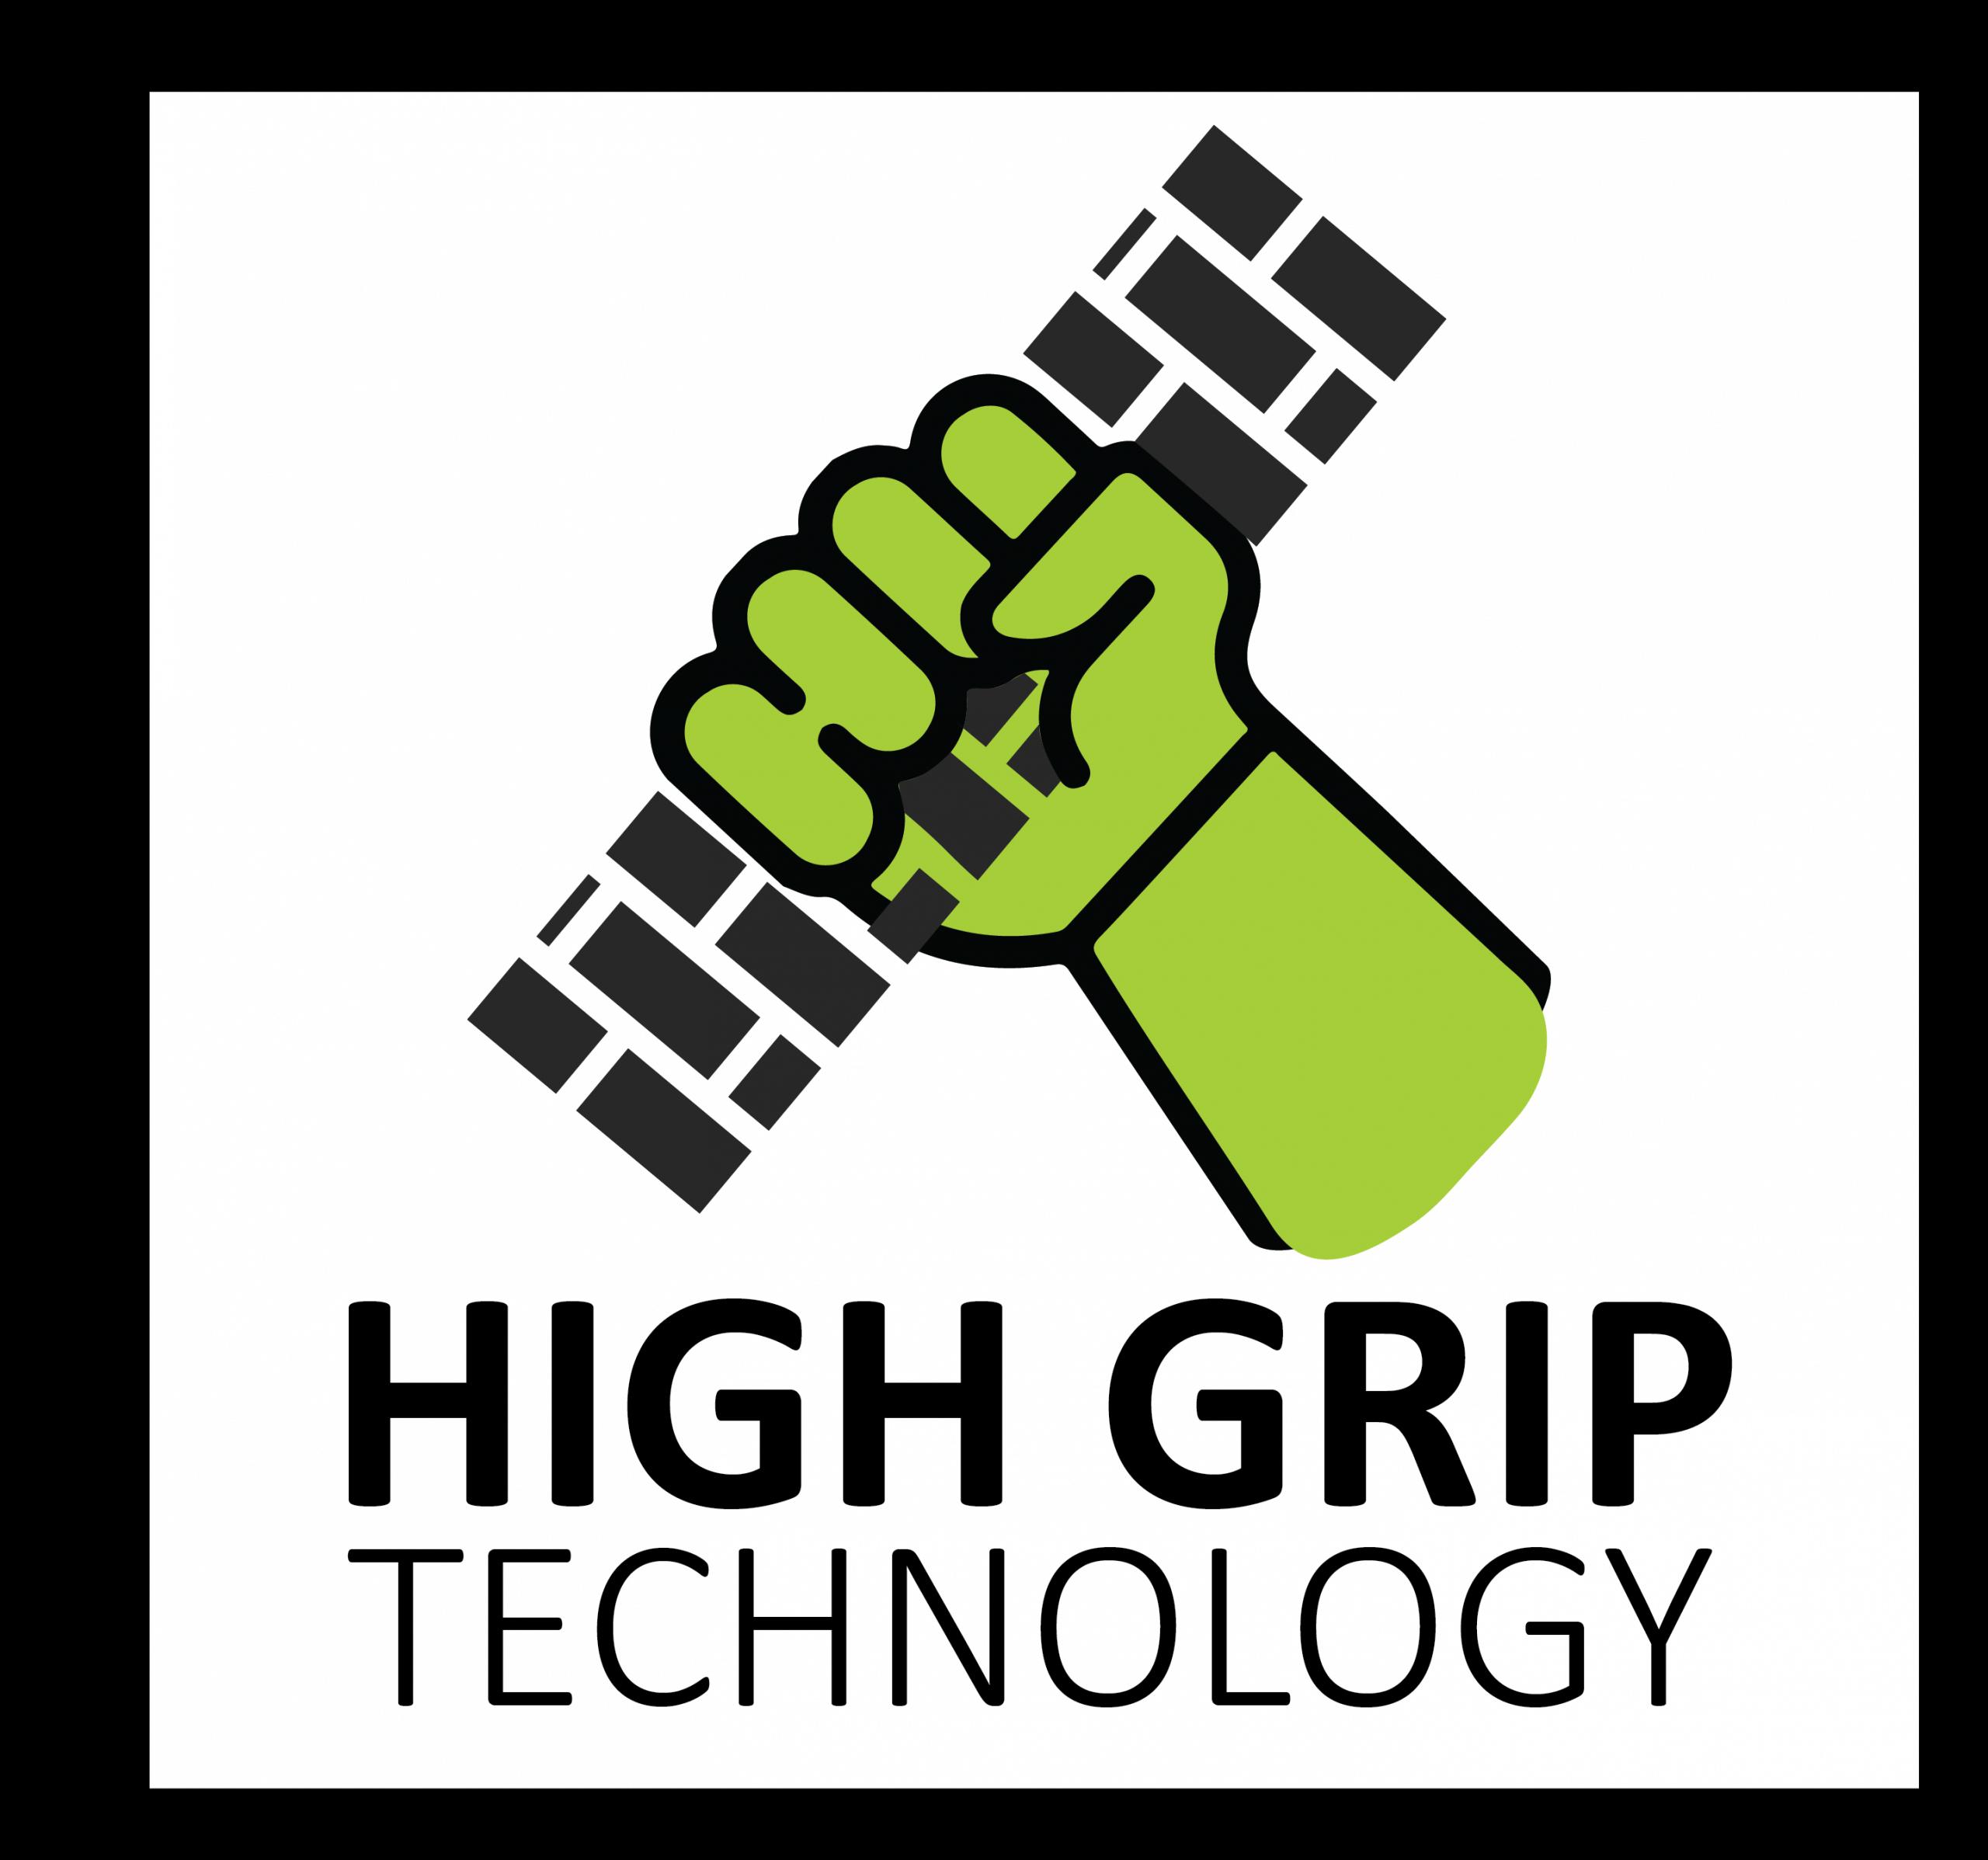 High Grip